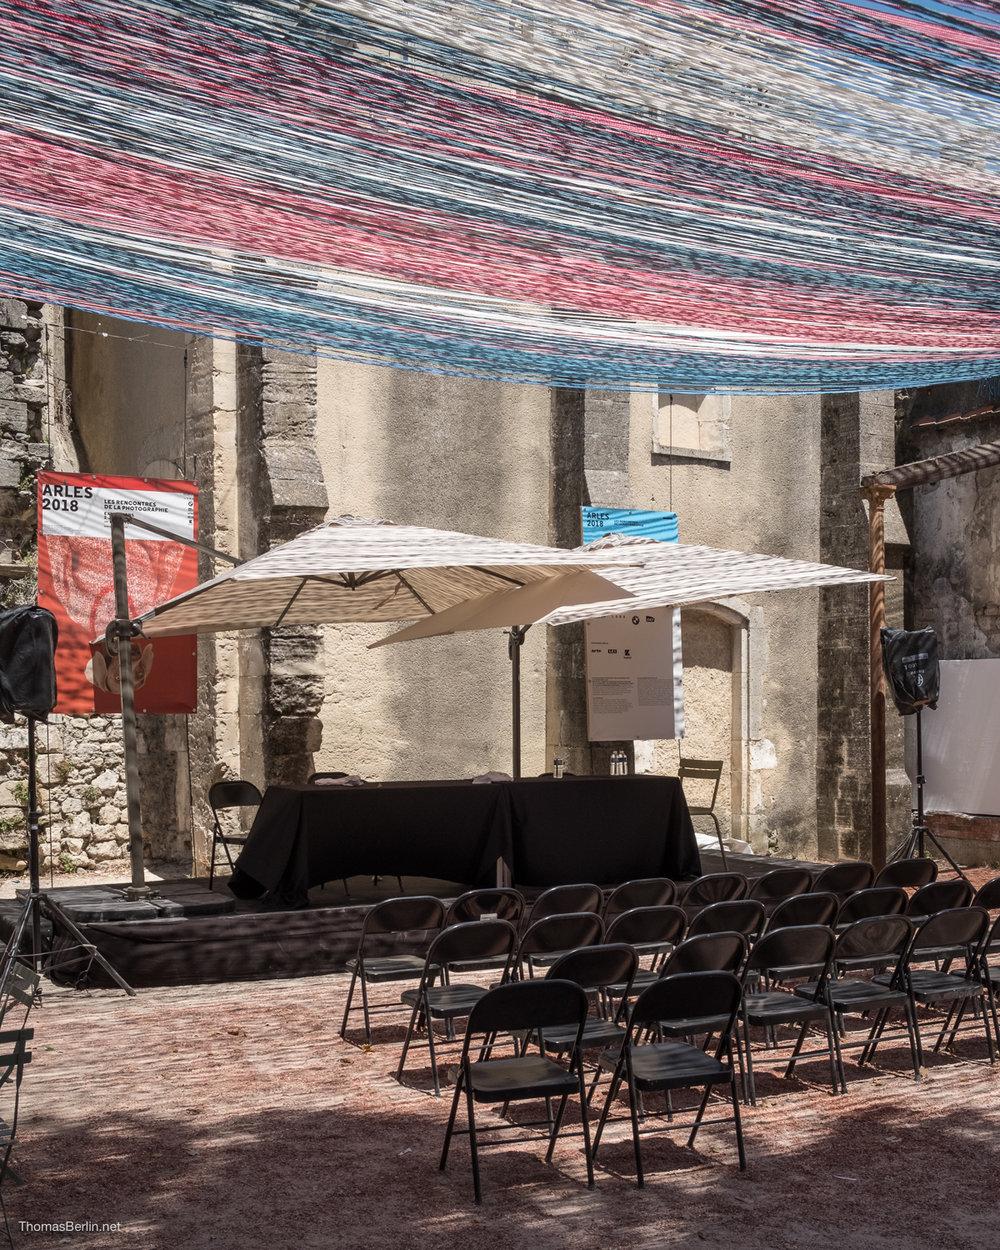 Thomas Berlin Arles 2018-8276.jpg